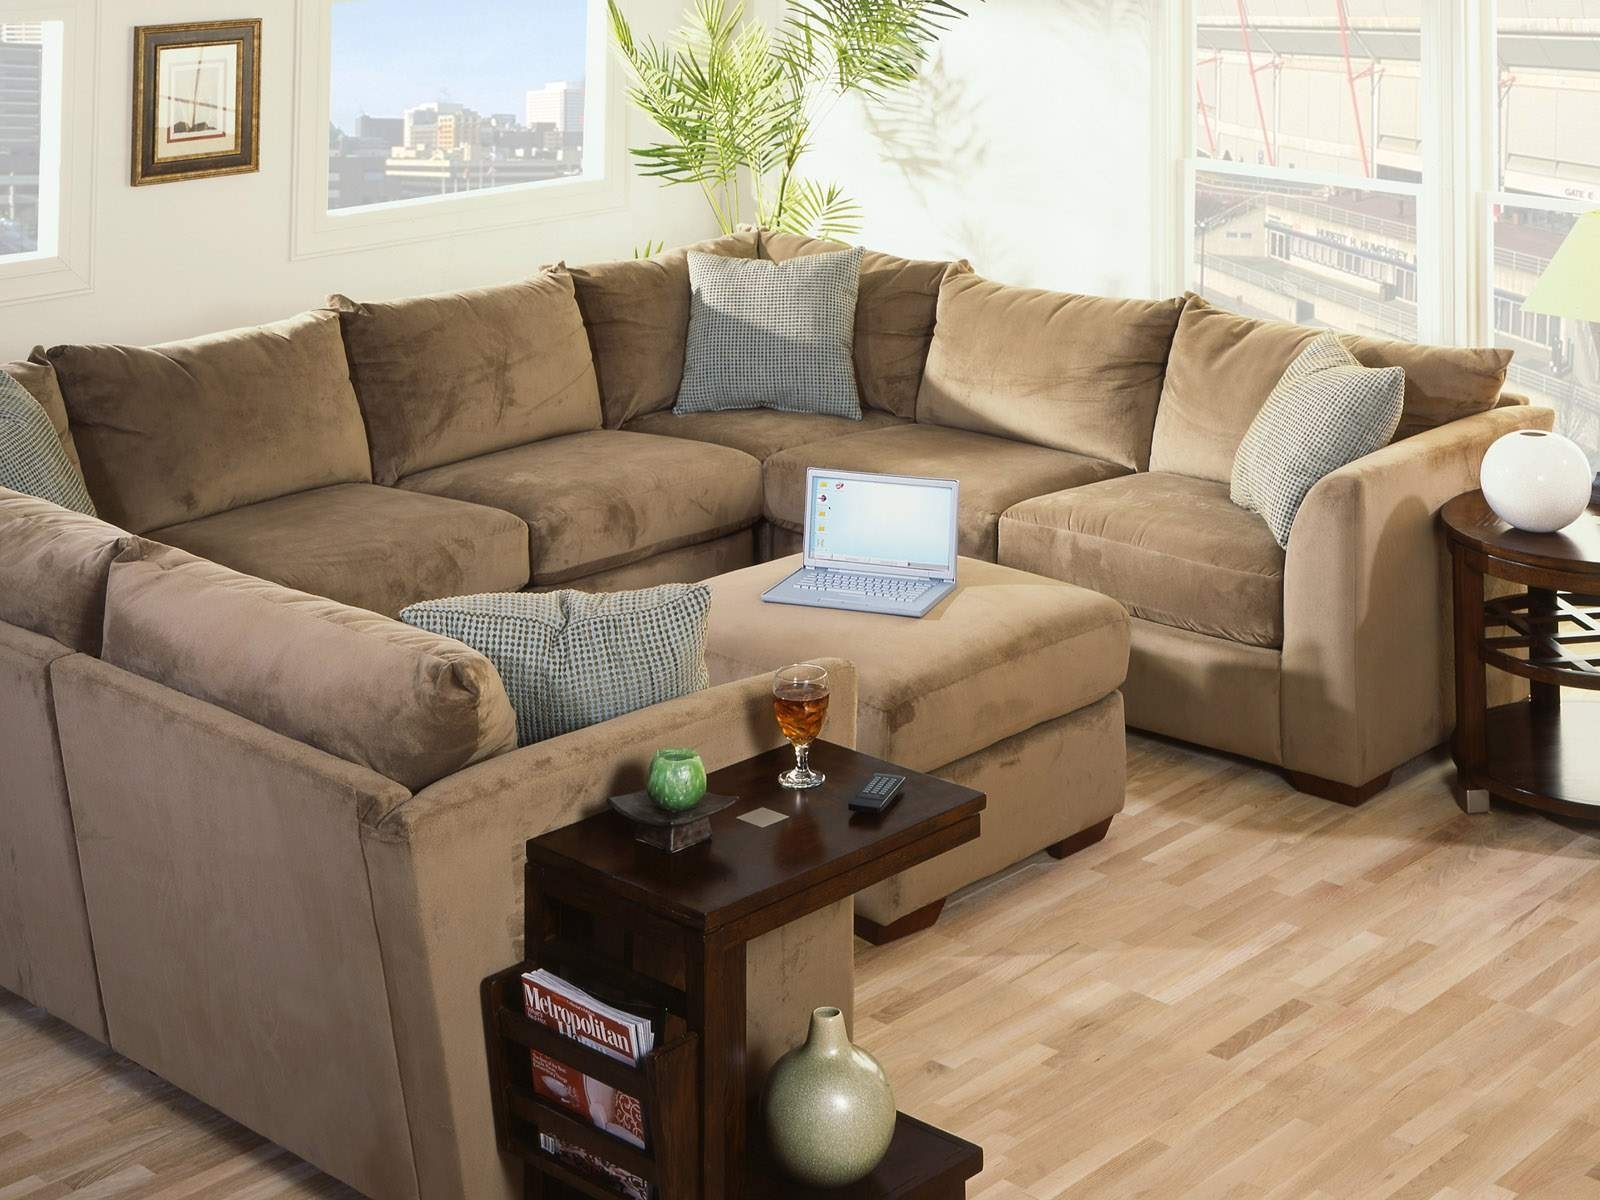 Furniture : Sectional Sofa Nailhead Trim Sectional Sofa Jamaica In Jamaica Sectional Sofas (View 8 of 10)